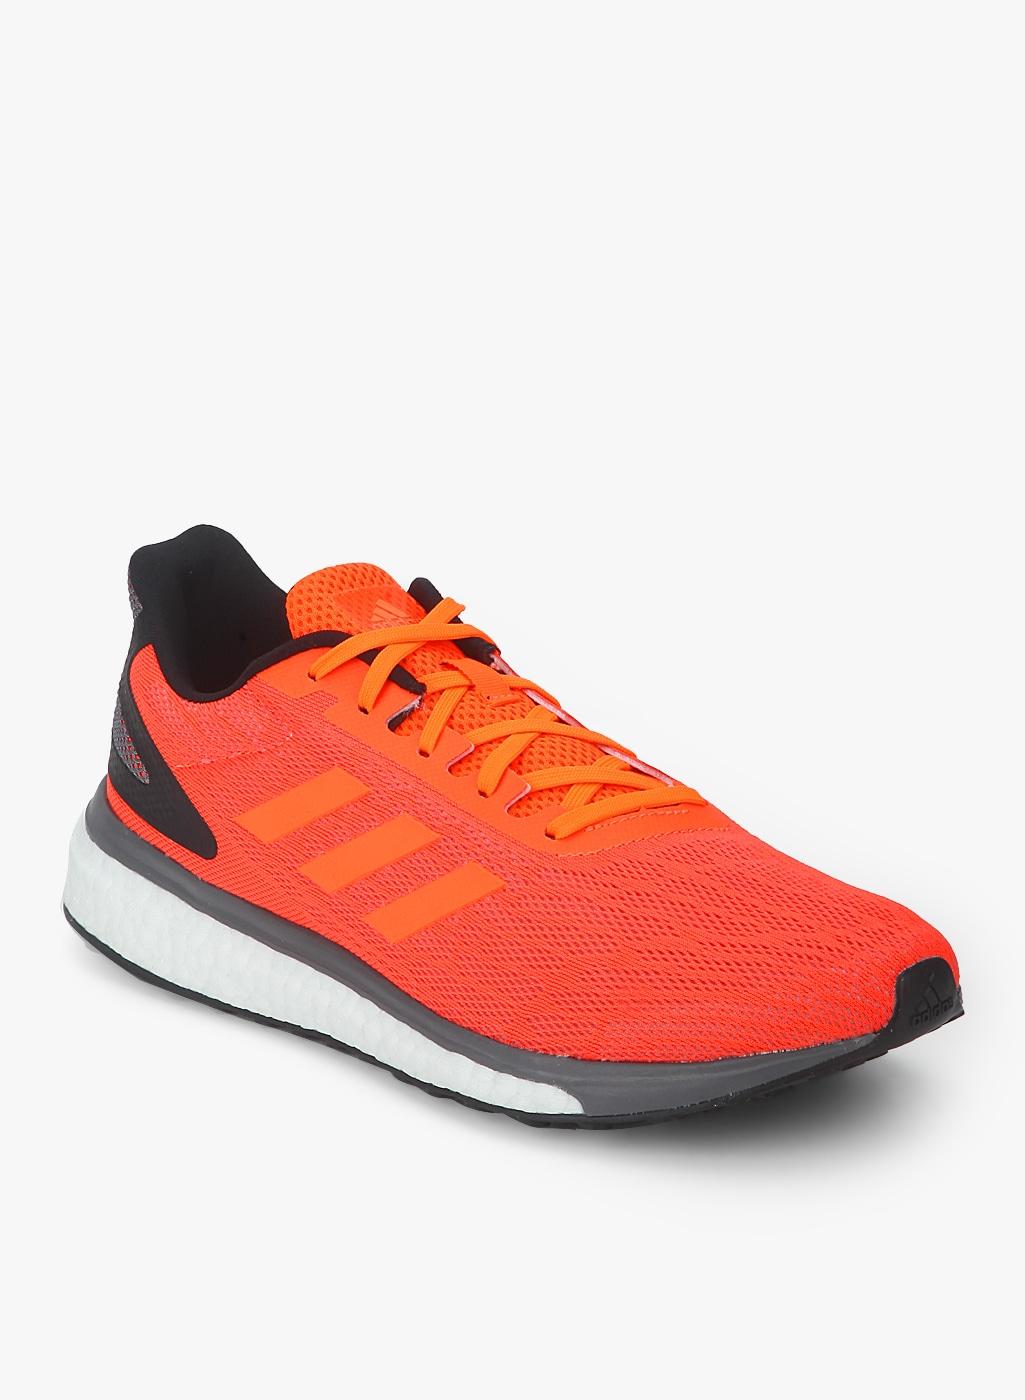 timeless design d6468 aa1a3 Adidas Orange Footwear - Buy Adidas Orange Footwear online in India